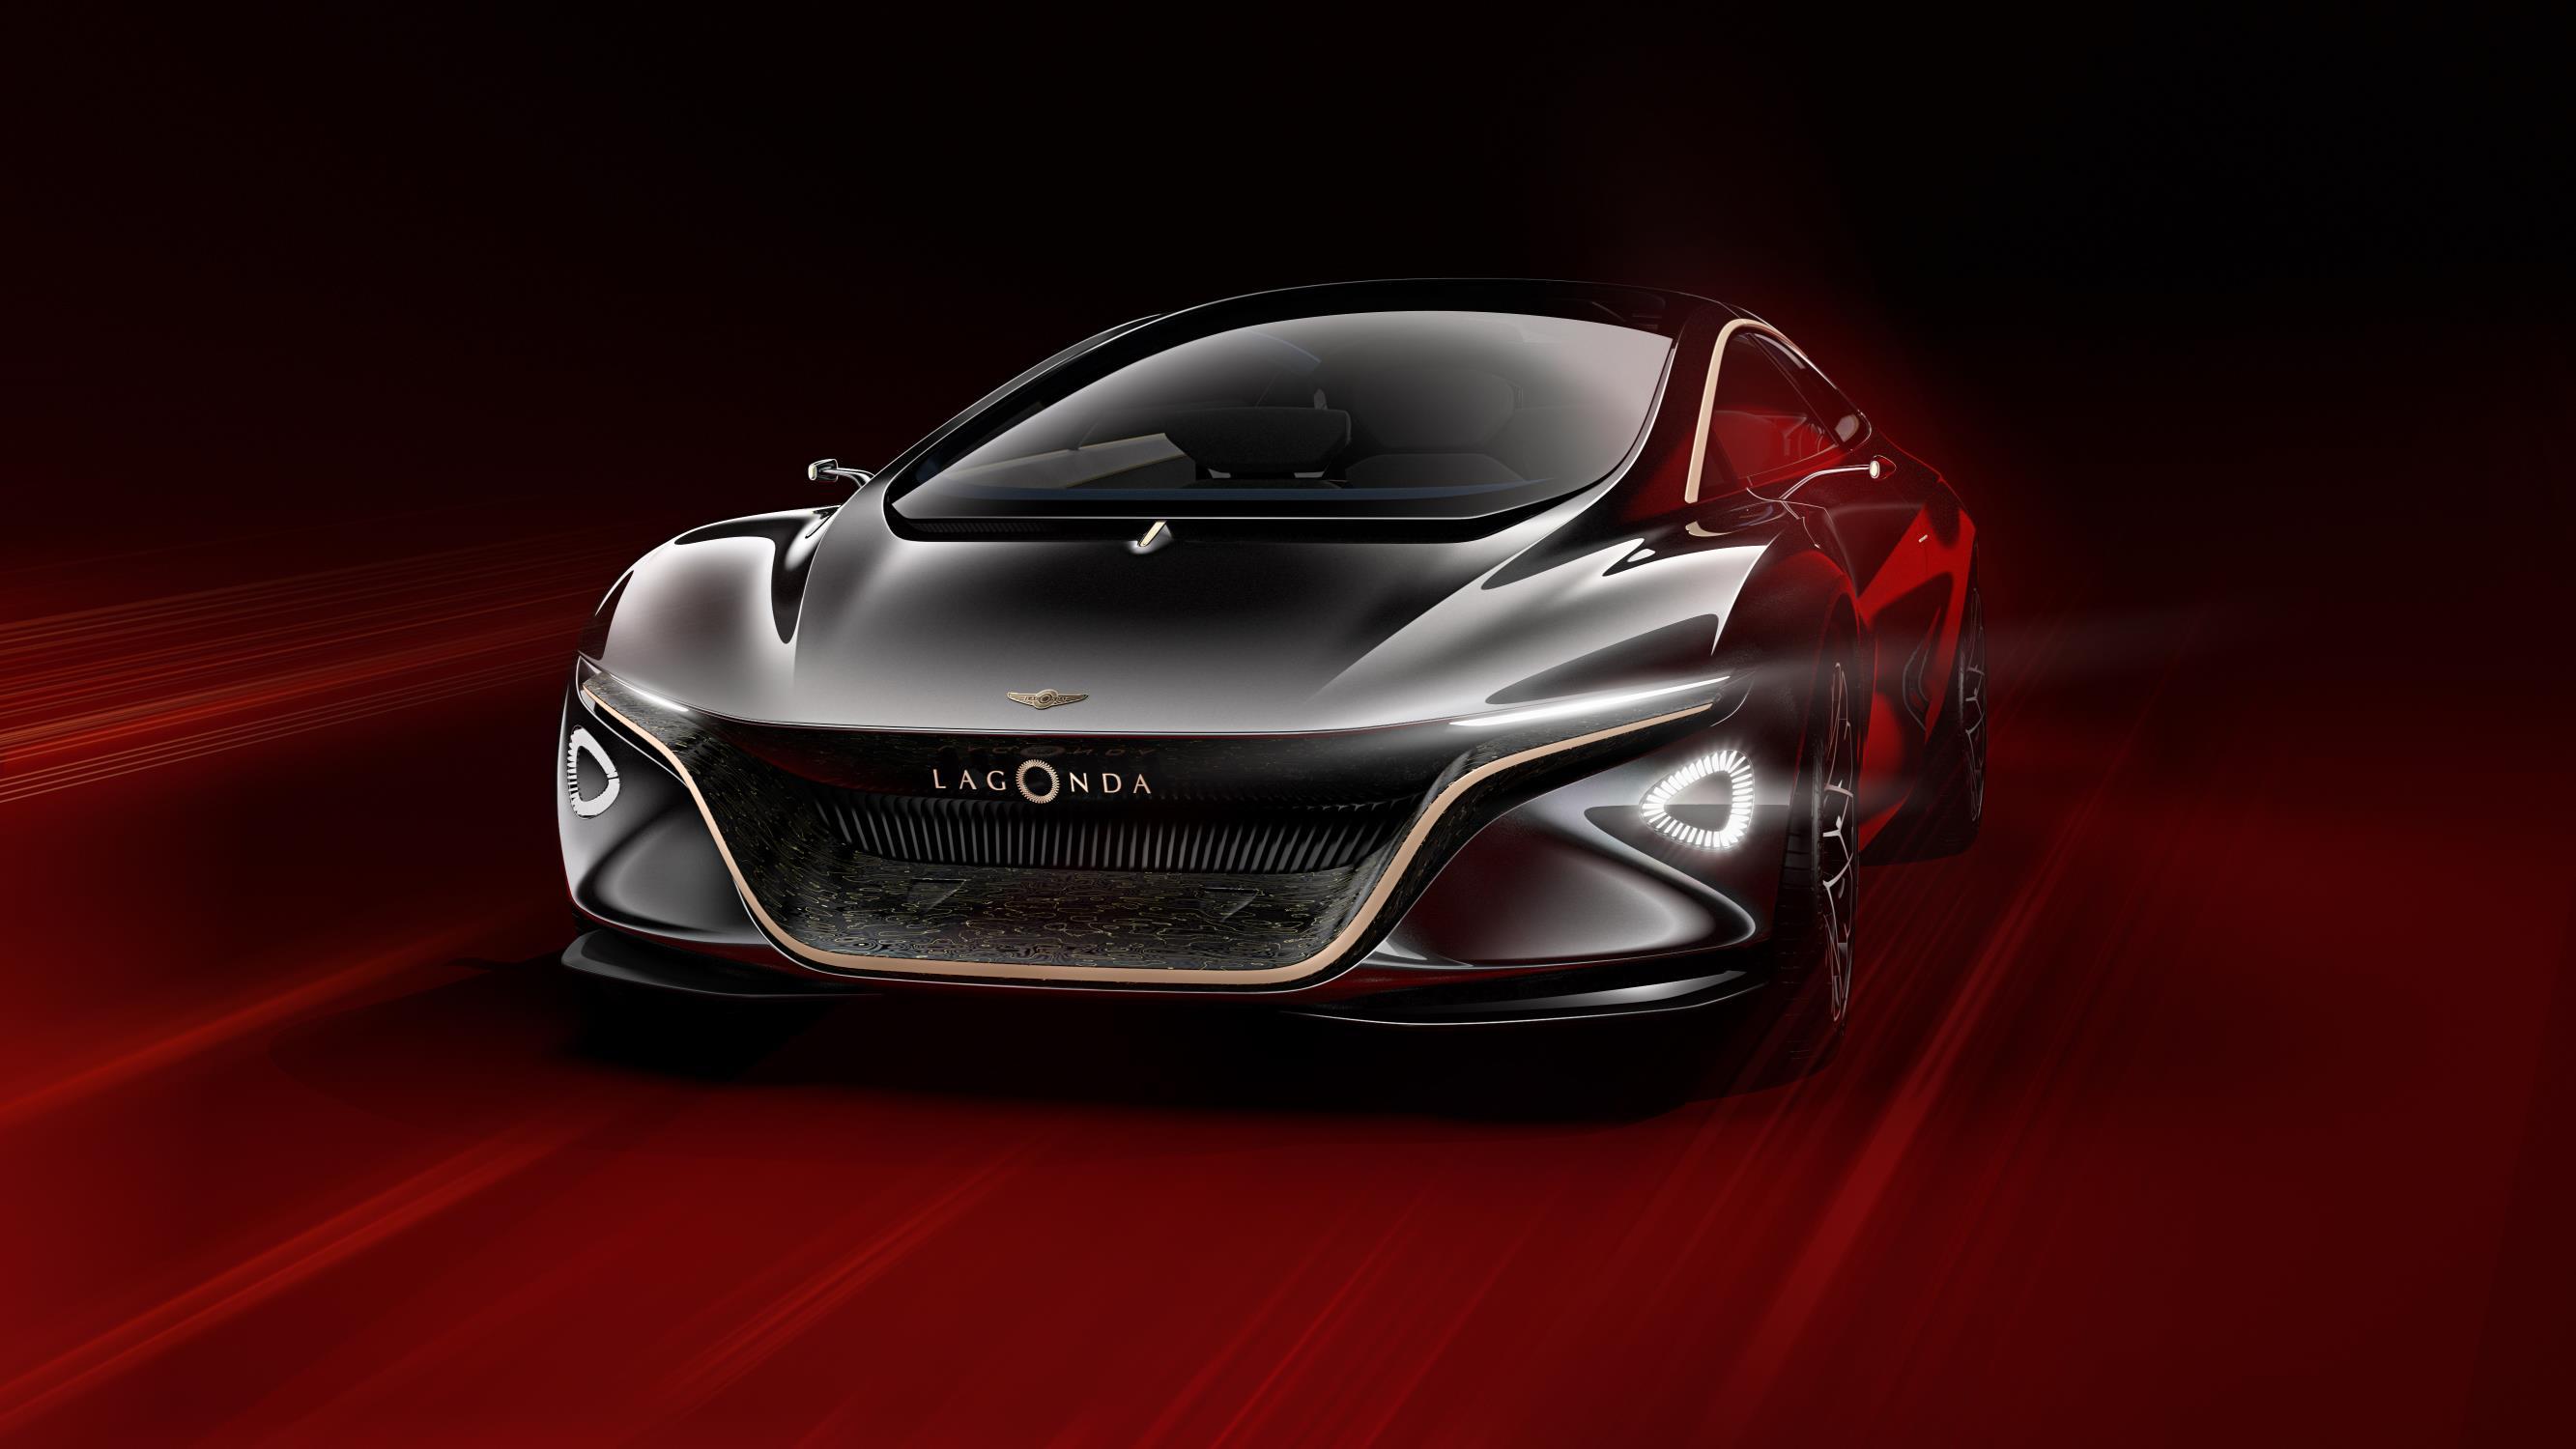 Aston Martin Lagonda's Vision Concept review